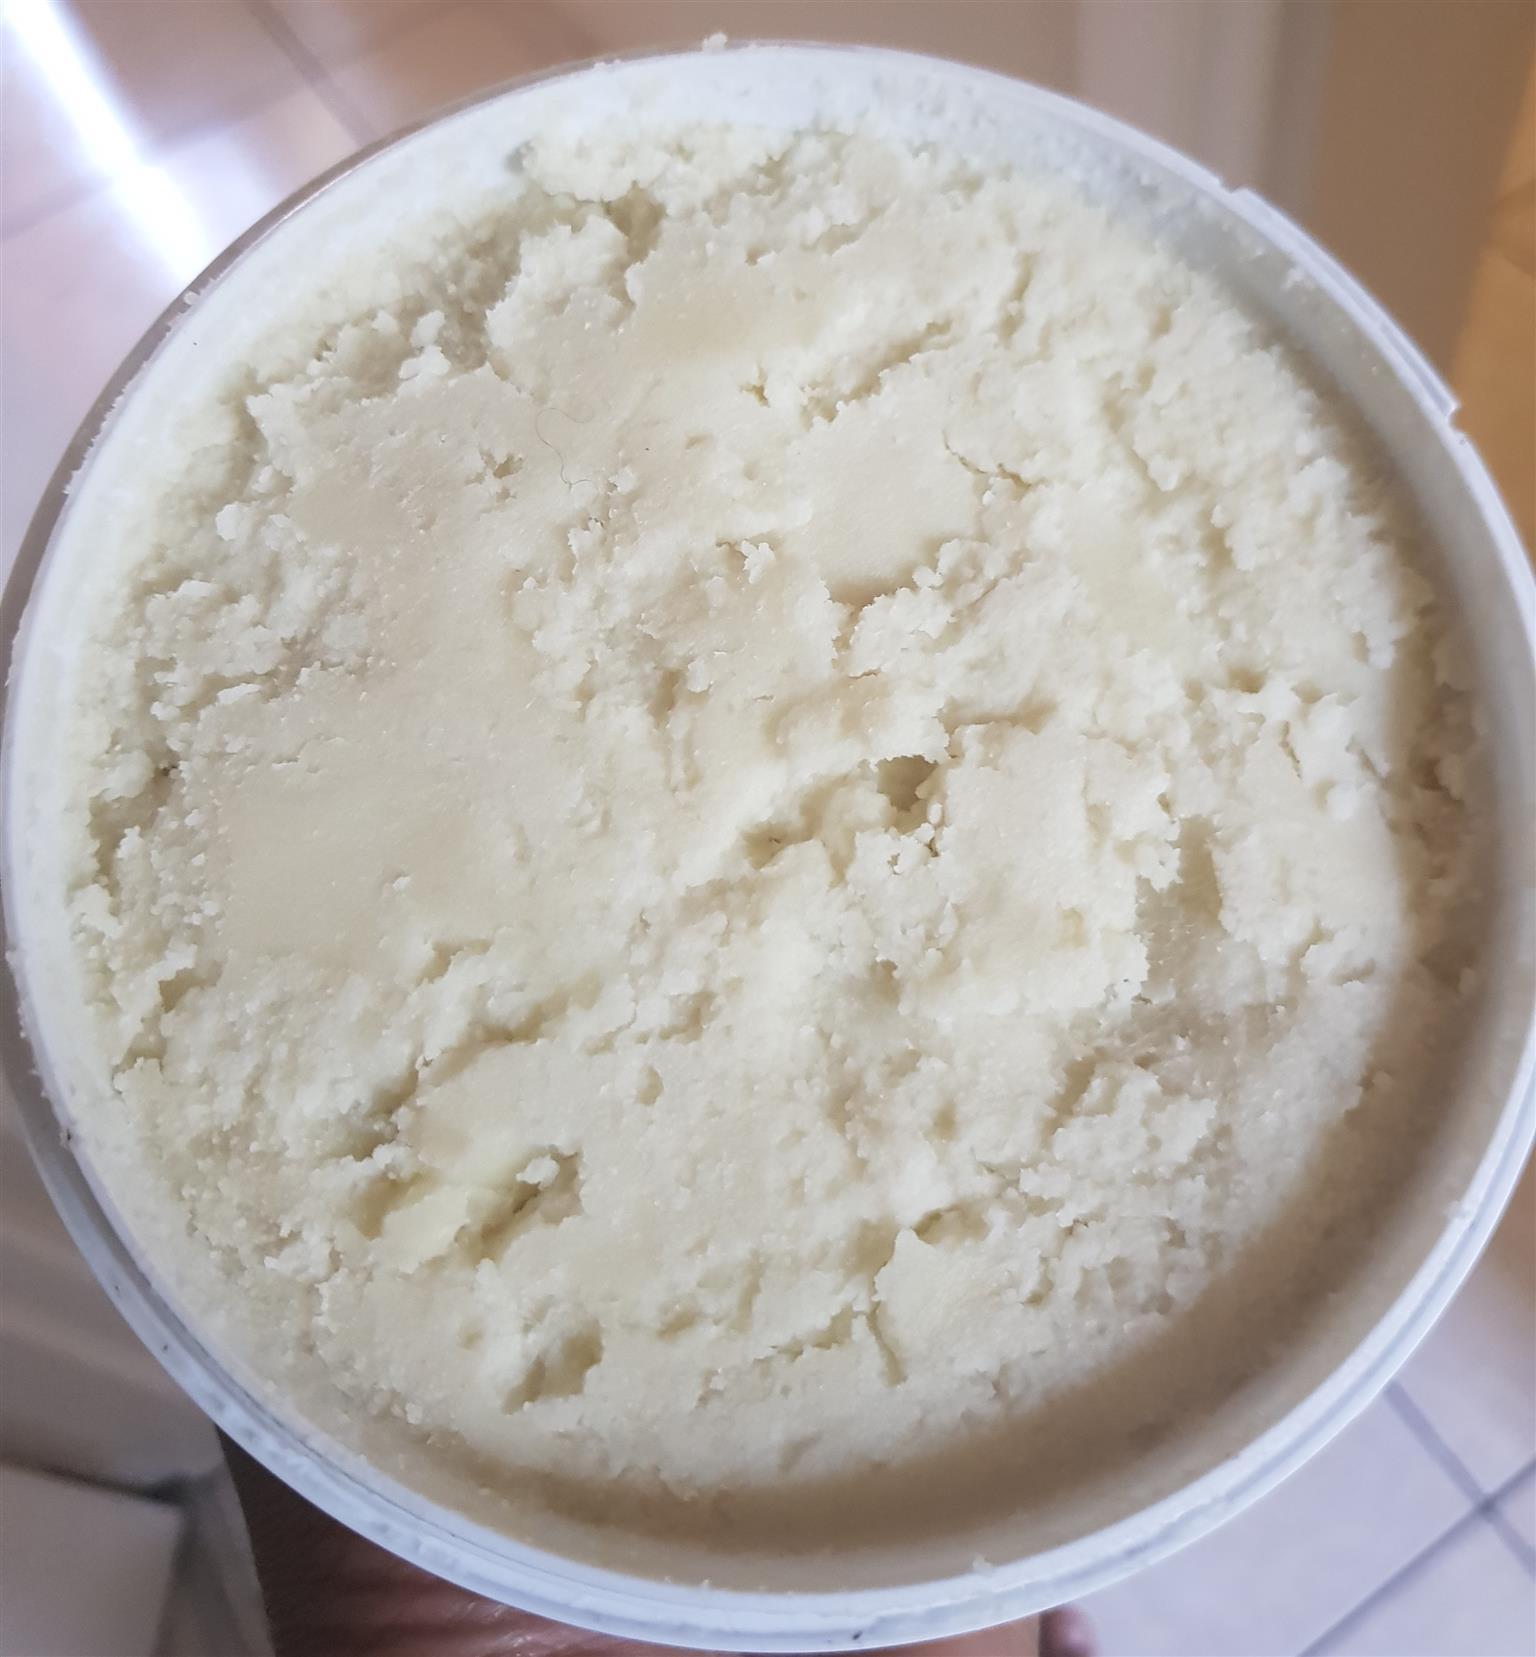 Raw unrefined Shea Butter